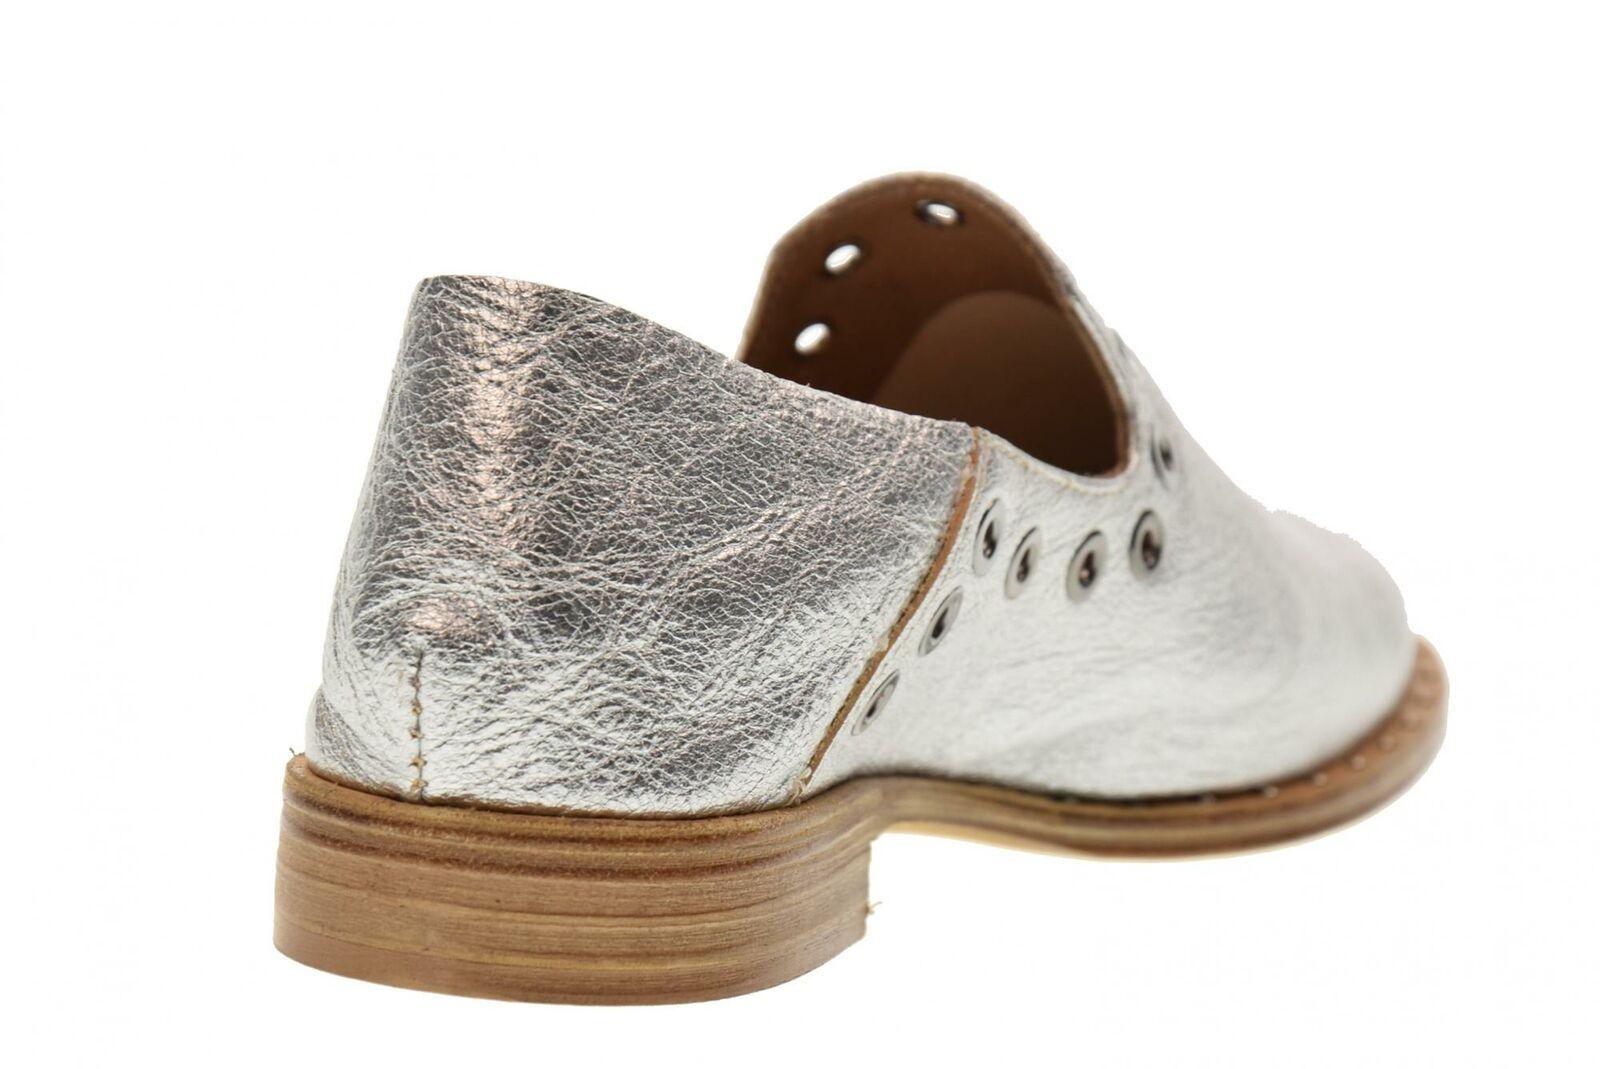 Erman's P18u shoes woman moccasin ST01 SILVER SILVER SILVER a4e65c